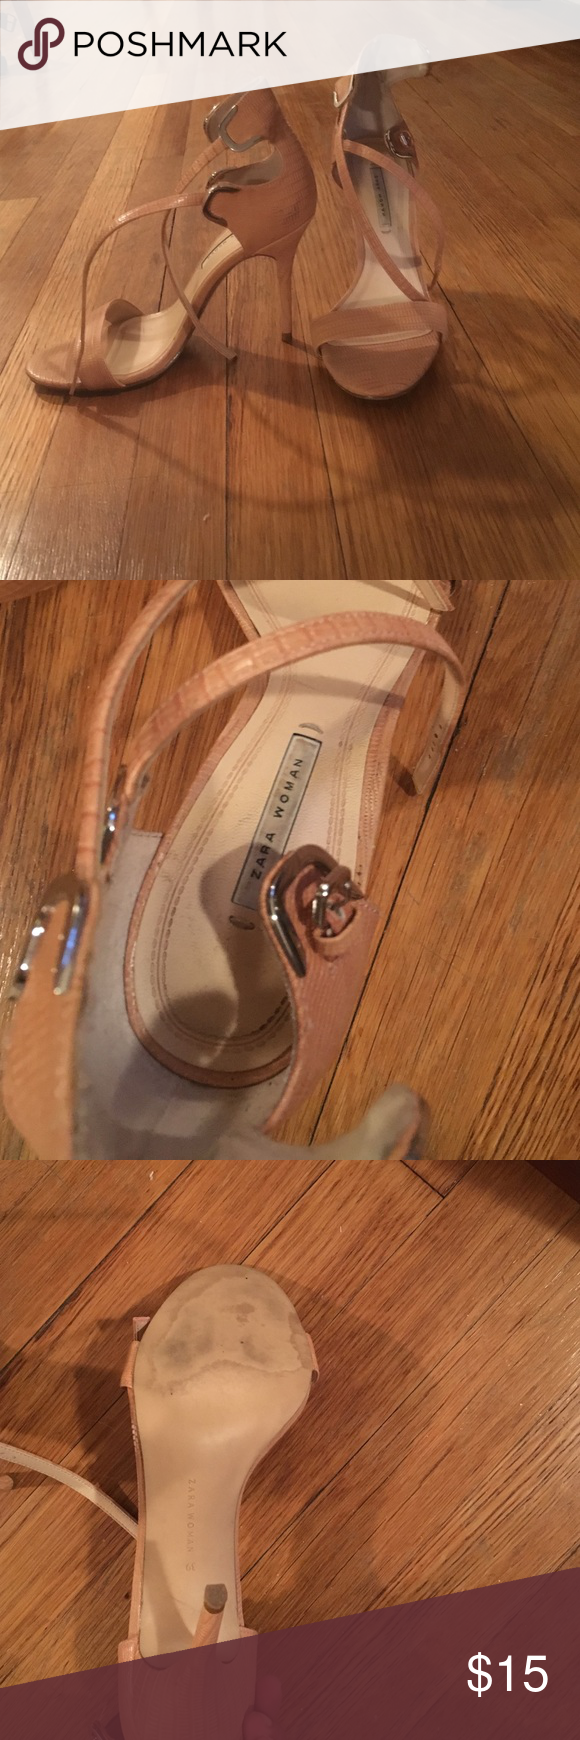 Peach open toe 3 inch Zara heels Super comfy Zara heels. Great with jeans and dresses. Zara Shoes Heels